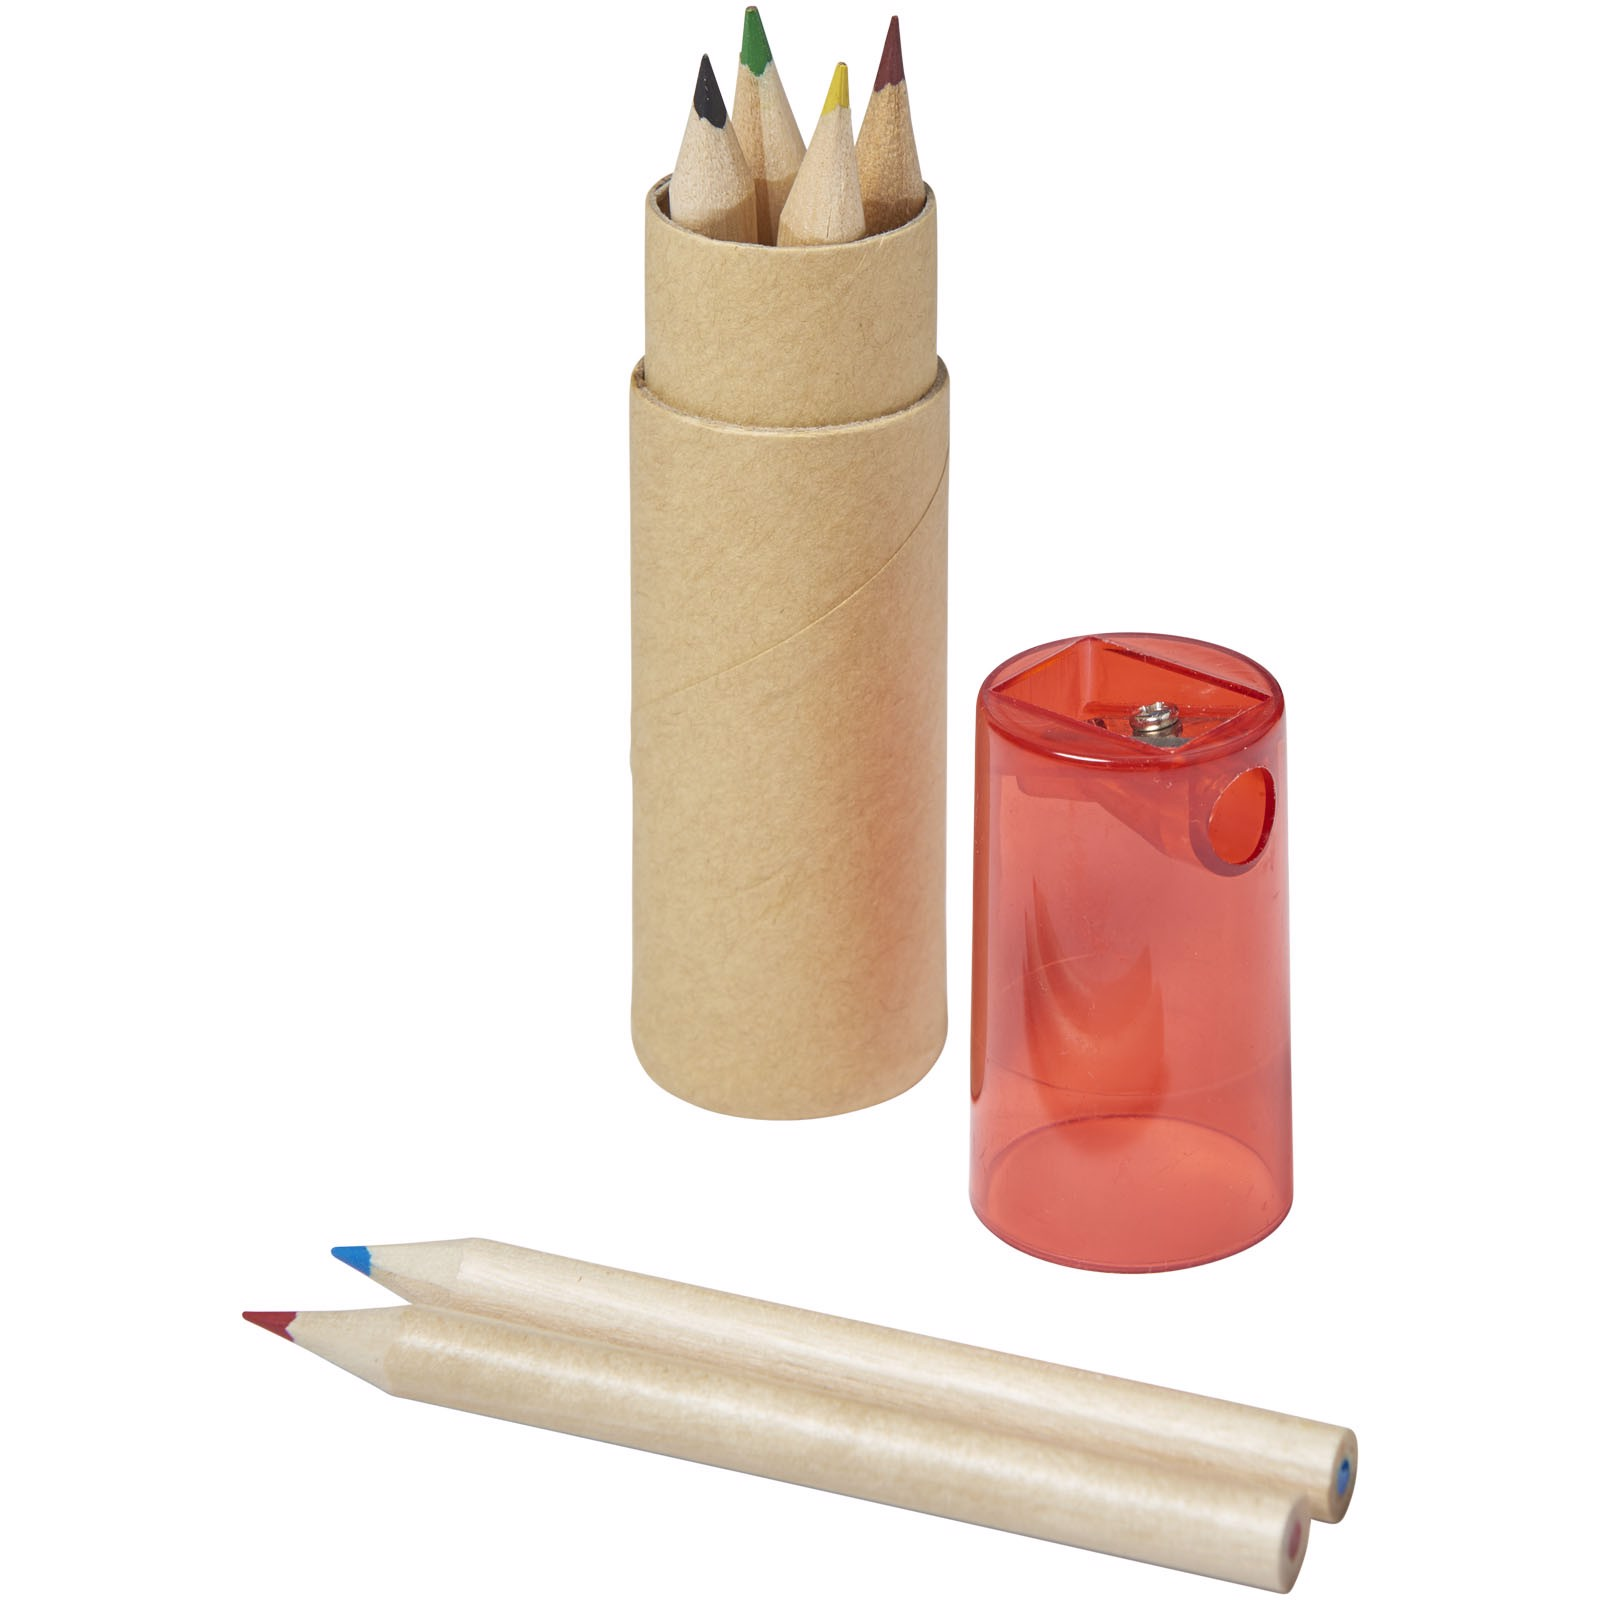 Kram 7-piece coloured pencil set - Red